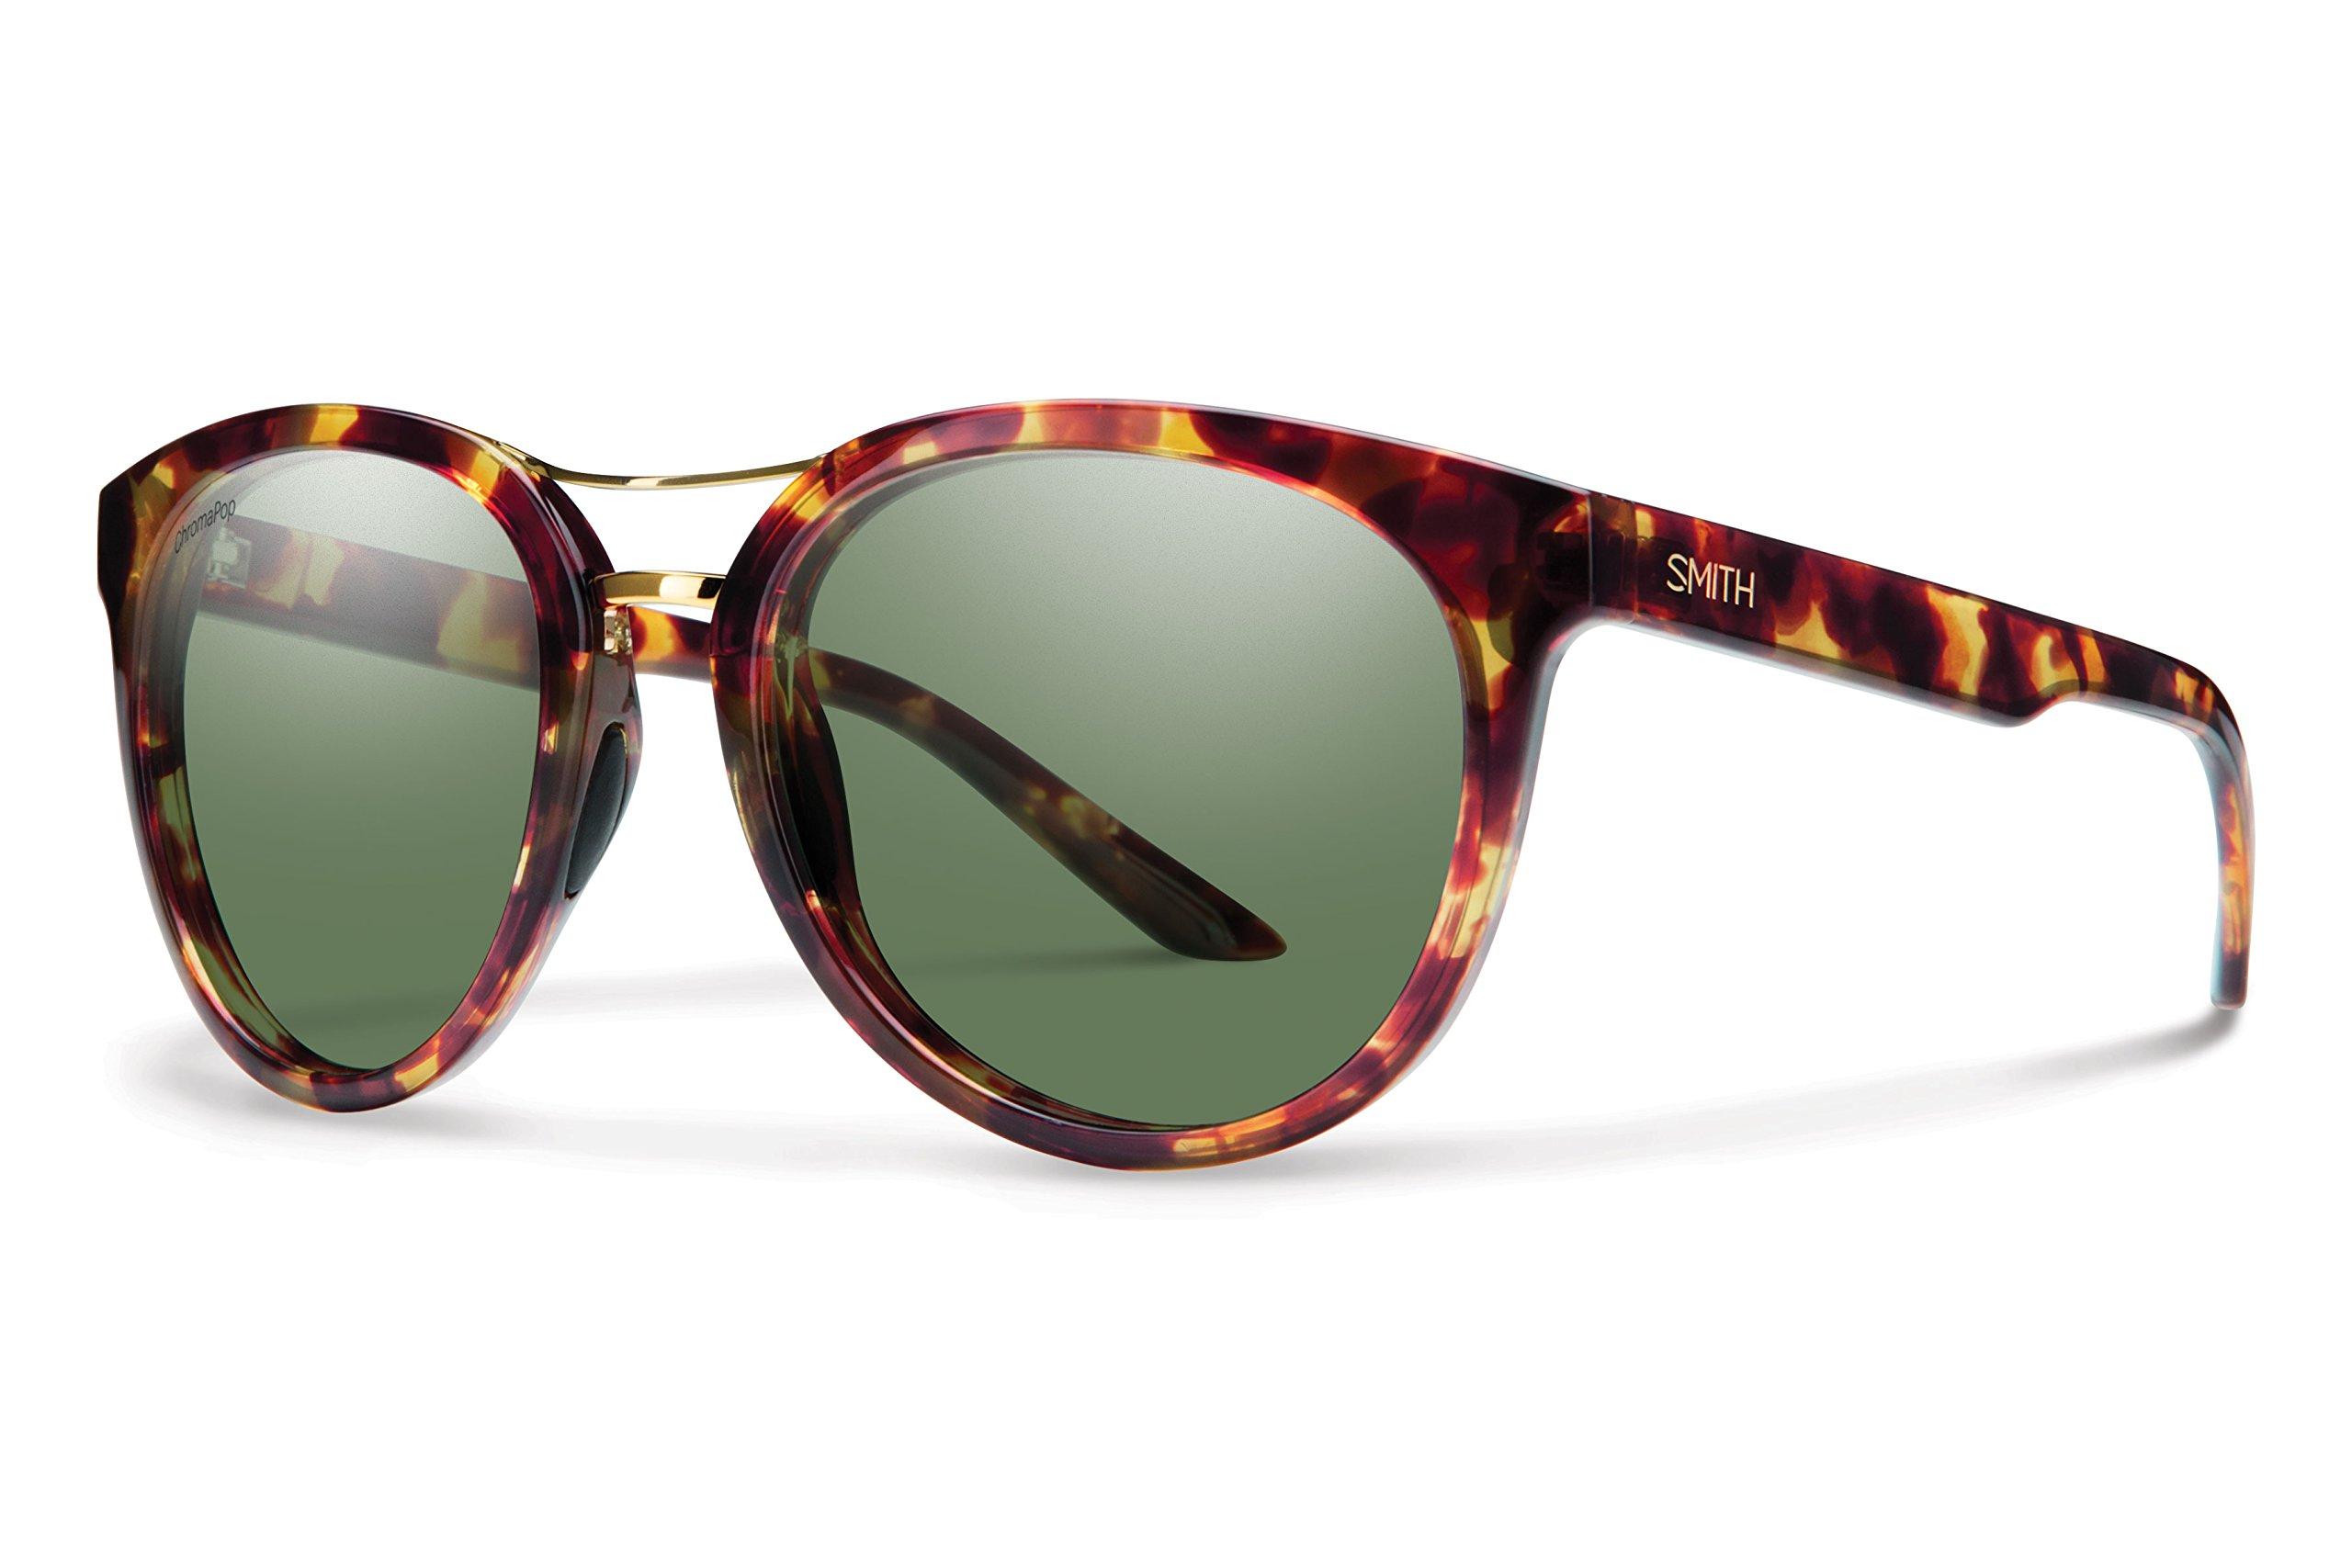 Smith Optics Bridgetown Chromapop Polarized Sunglasses, Tortoise, Gray green